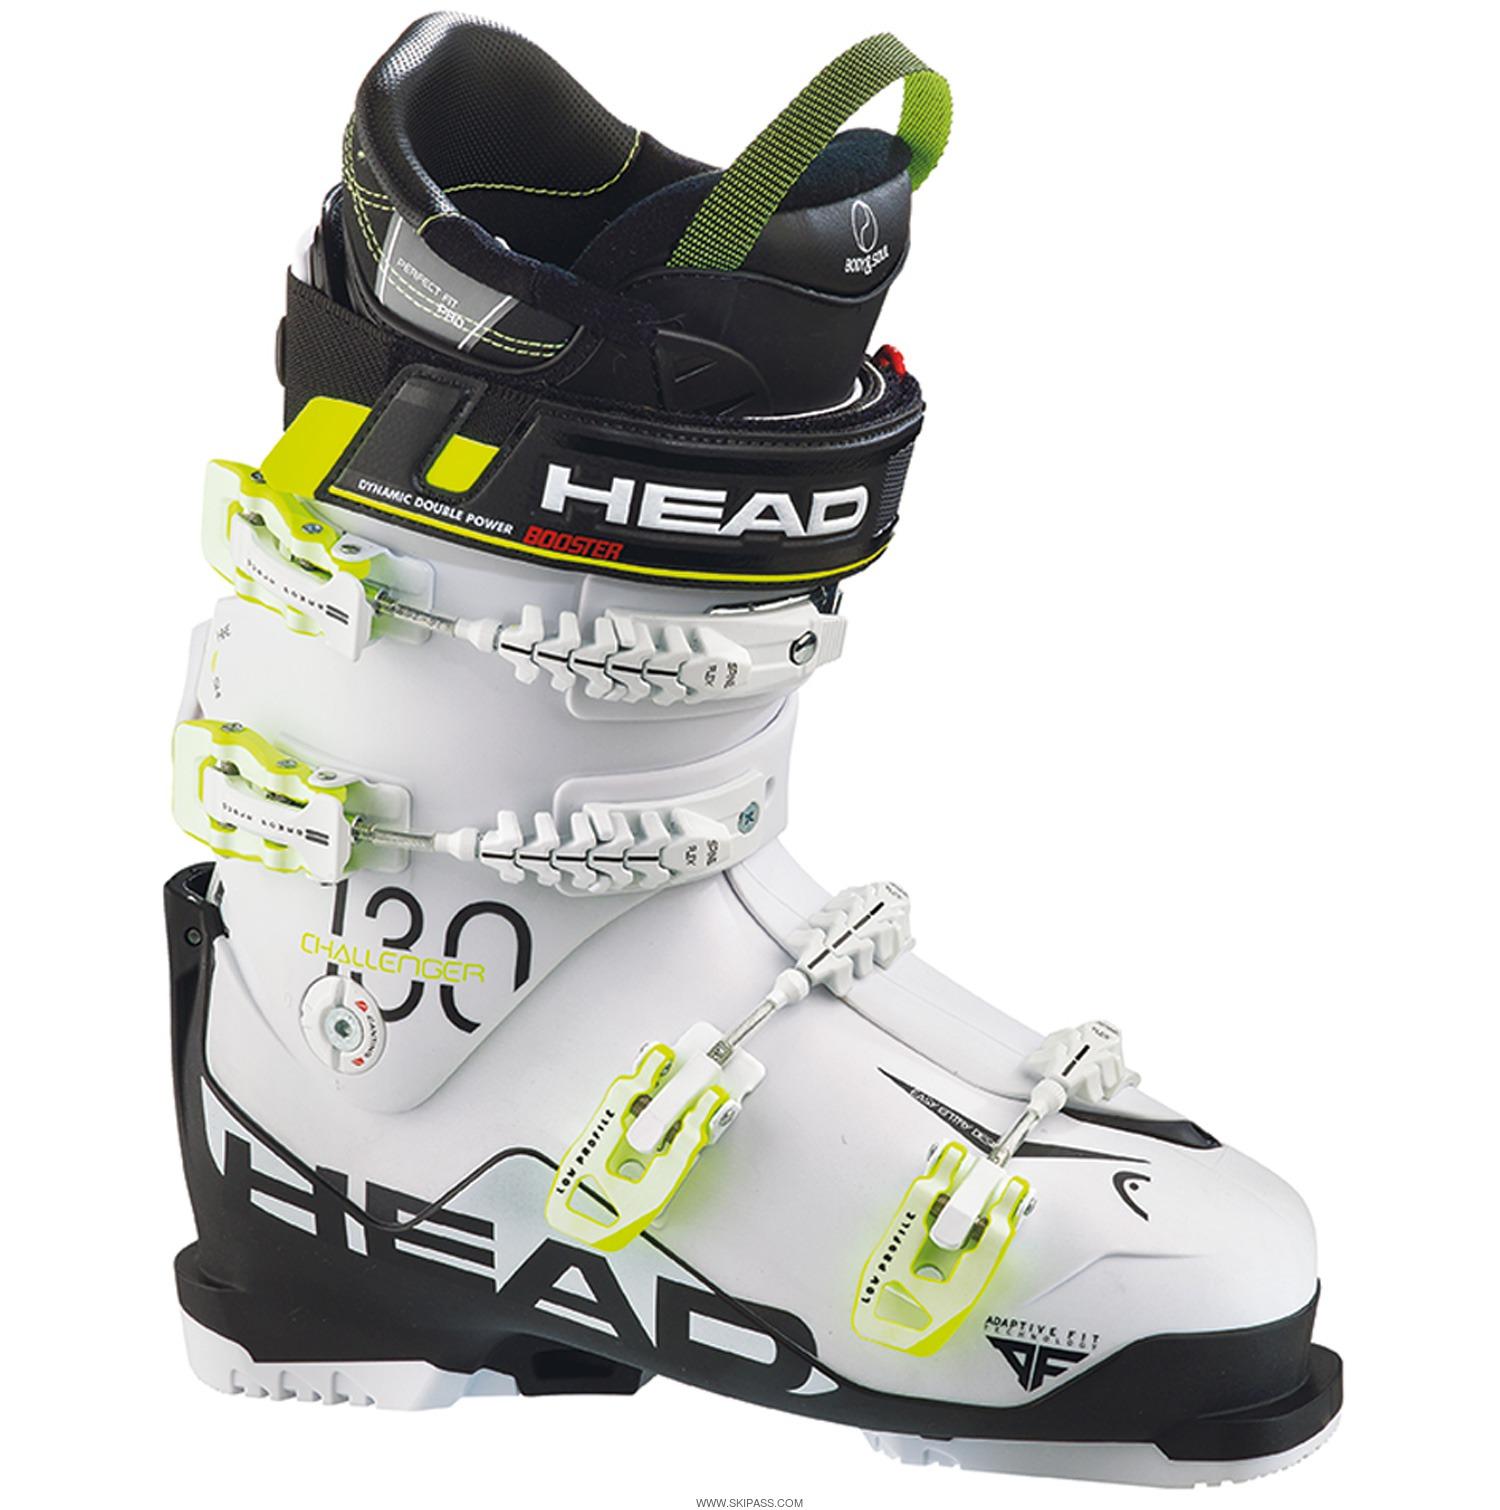 chaussures de ski head challenger 120. Black Bedroom Furniture Sets. Home Design Ideas